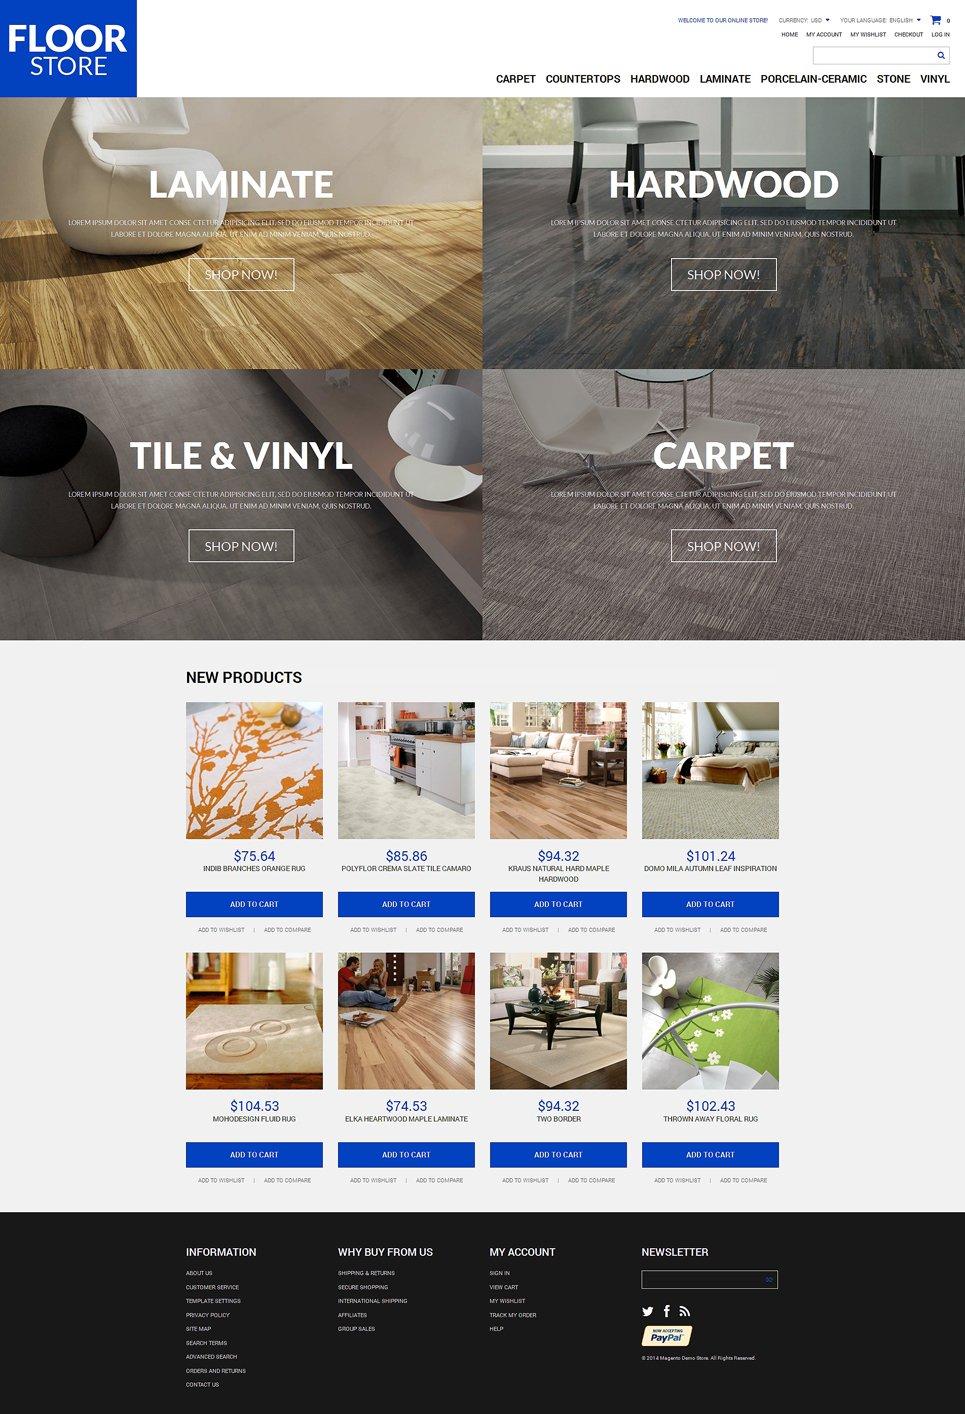 Floor Materials Store Magento Theme #49312